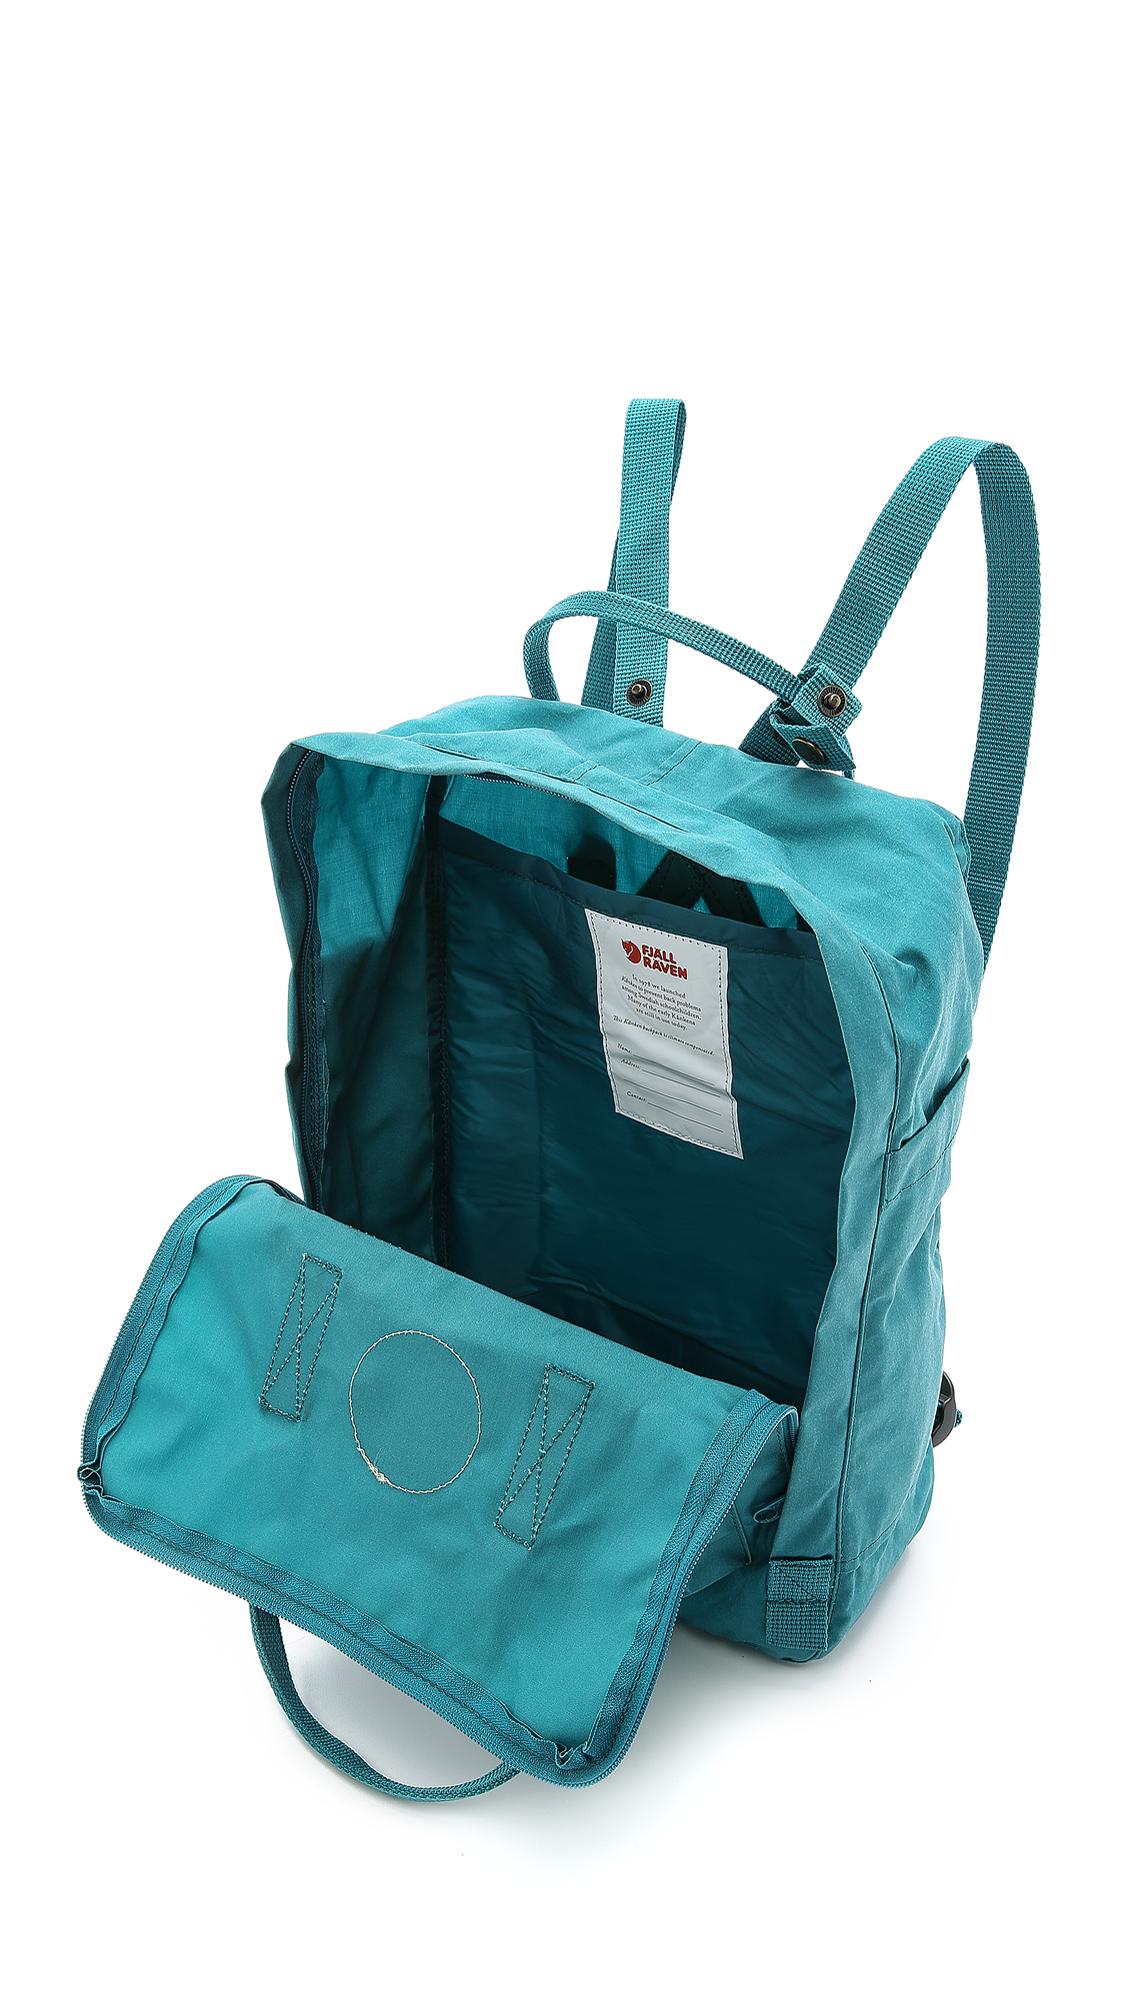 fjallraven kanken classic backpack ocean green